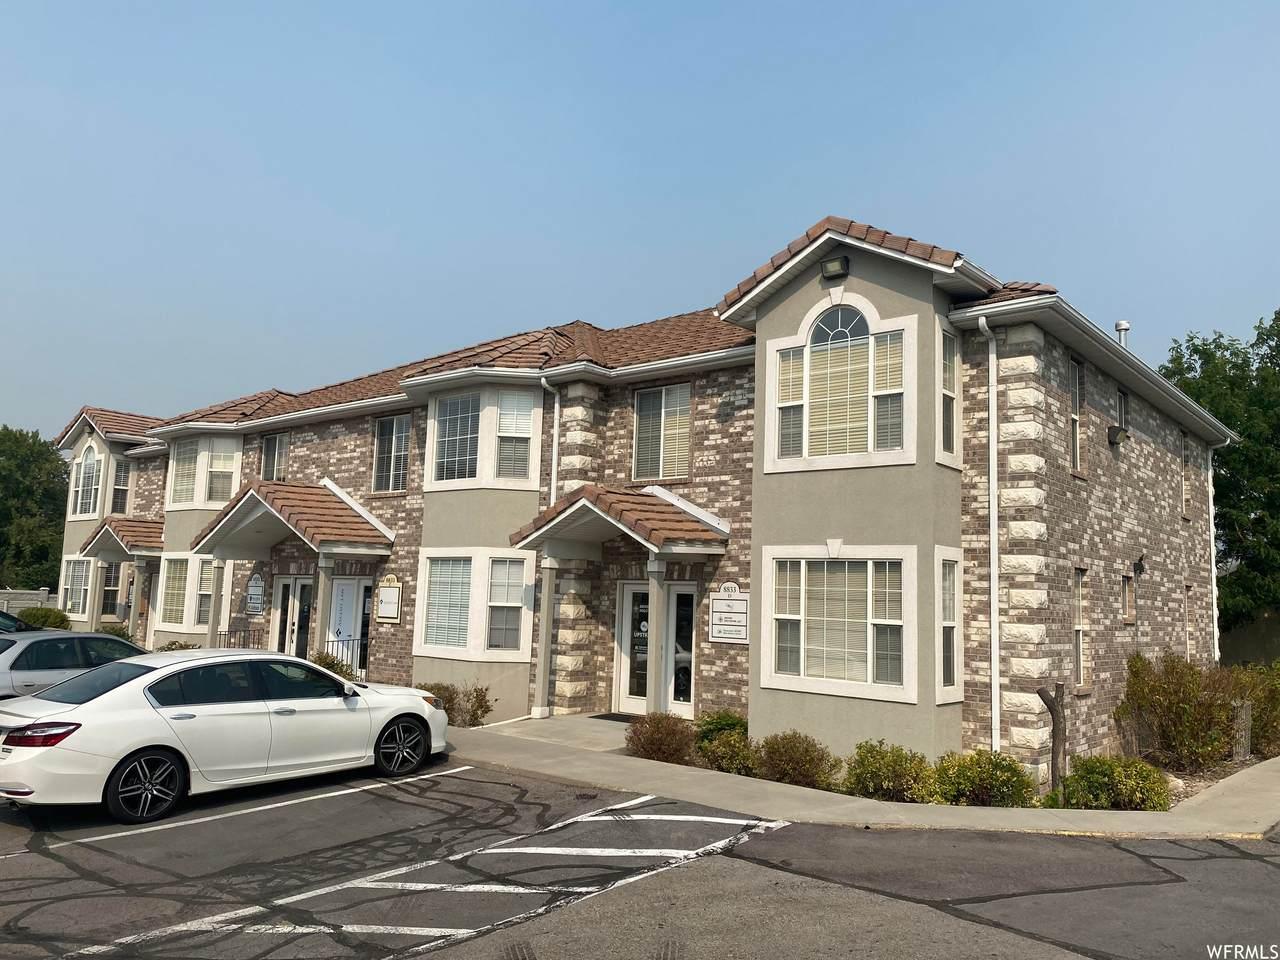 8833 Redwood Rd - Photo 1